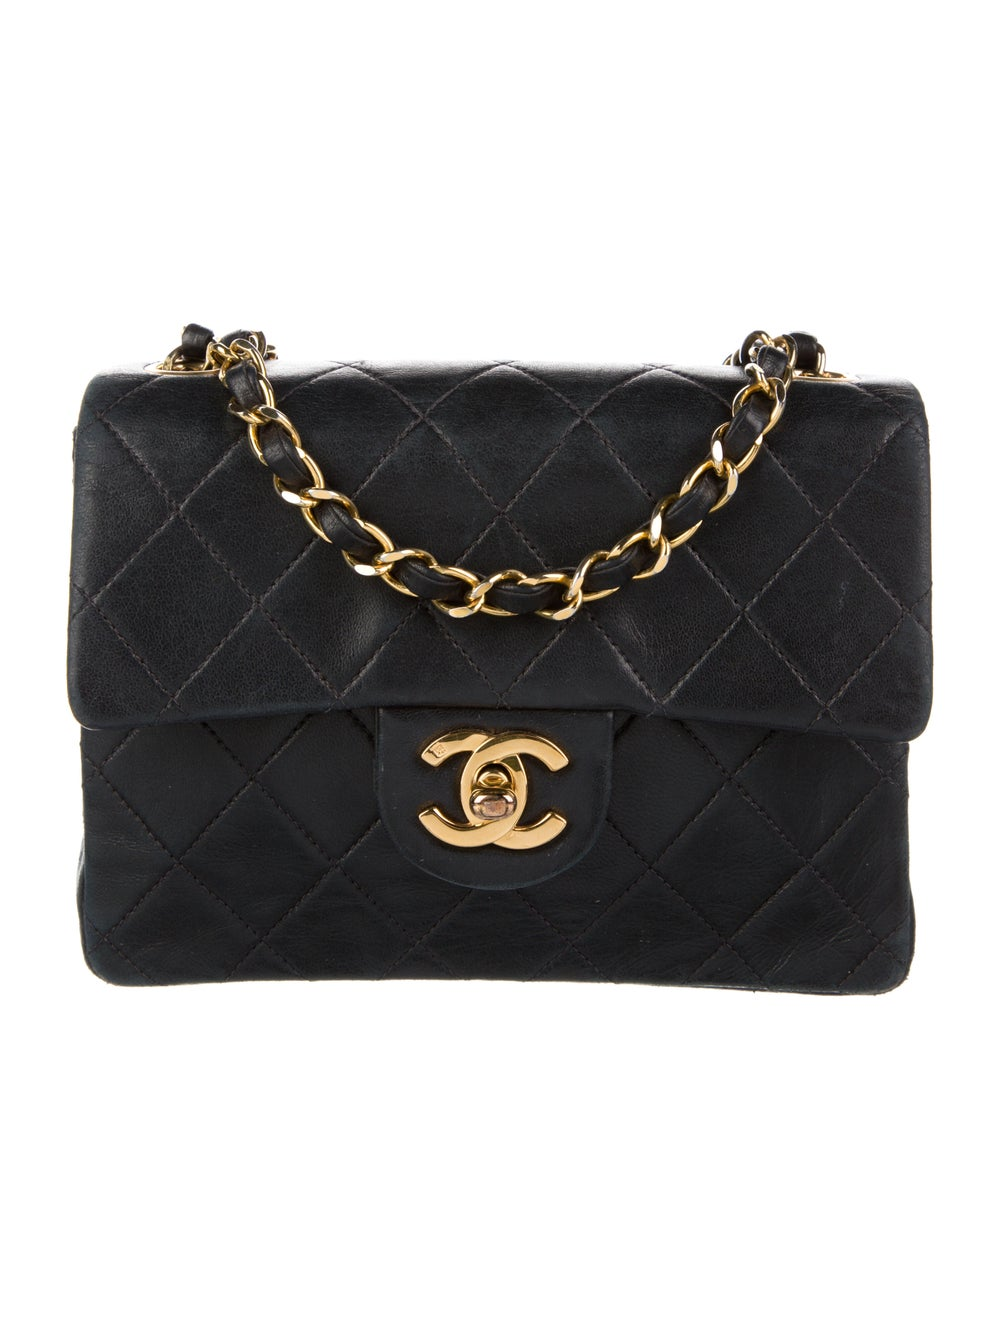 Chanel Vintage Mini Square Flap Bag Blue - image 1